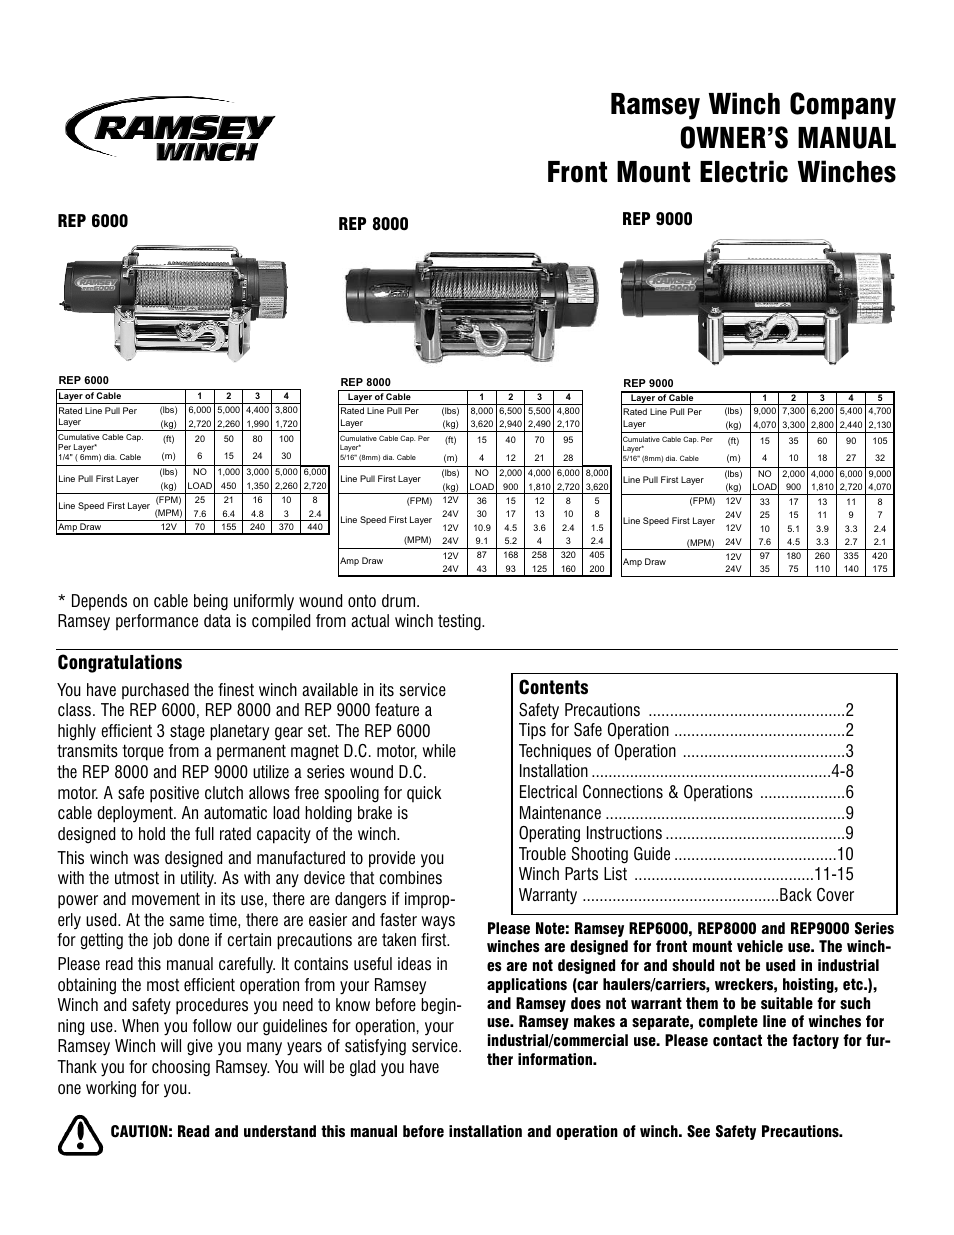 medium resolution of warn winch 9500 wiring diagram warn 8274 wiring diagram ramsey winch motor wiring diagram solenoid switch wiring diagram